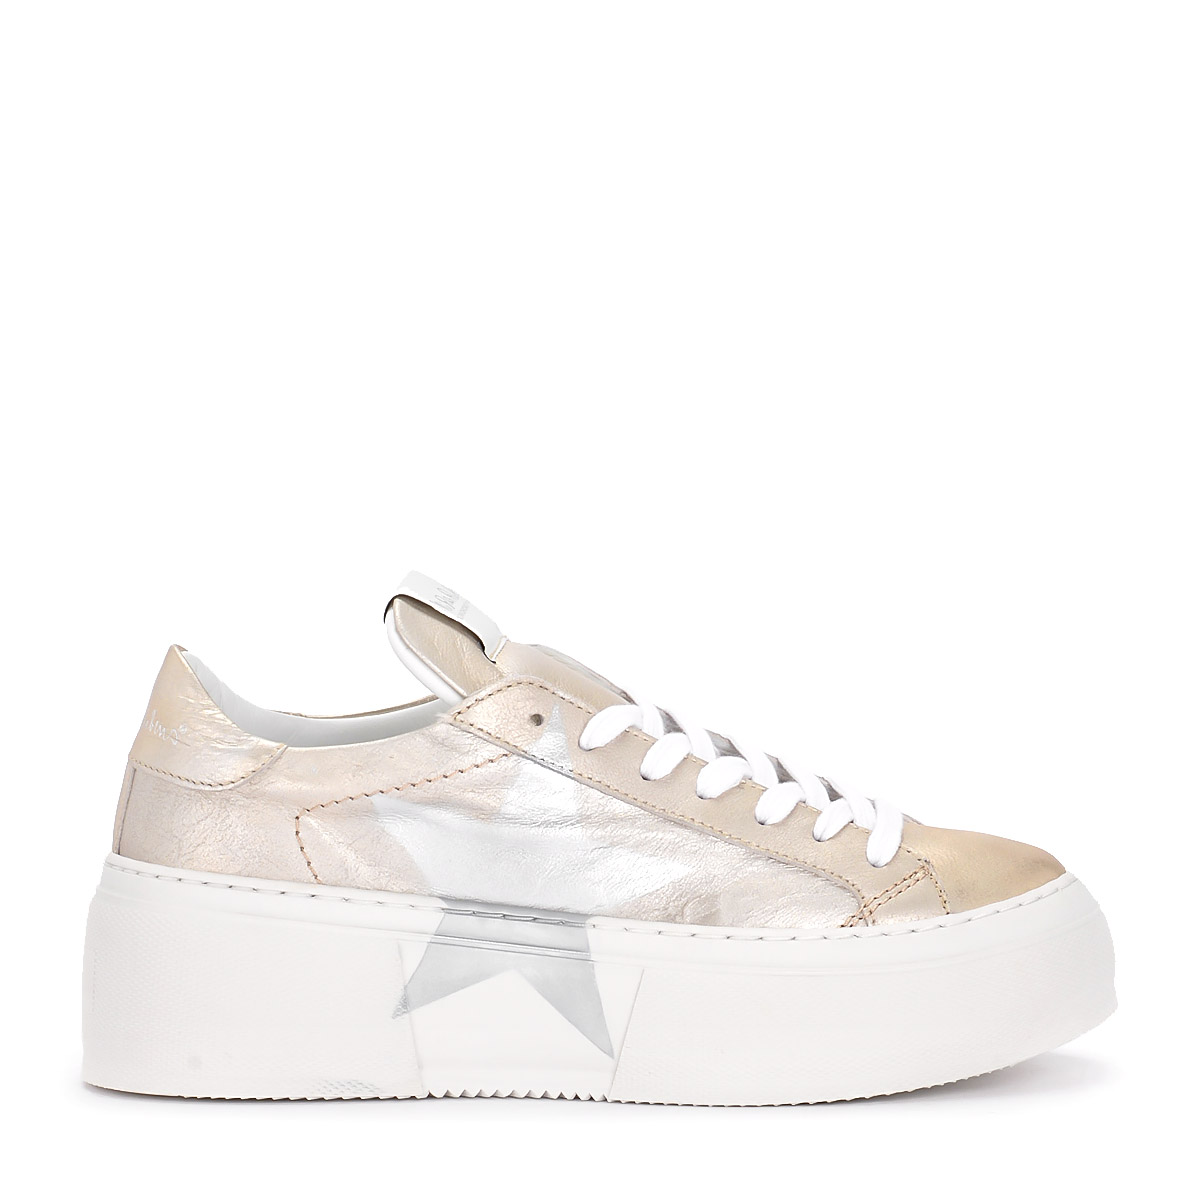 Sneaker Nira Rubens Mimosa Leather Platinum and Silver Star